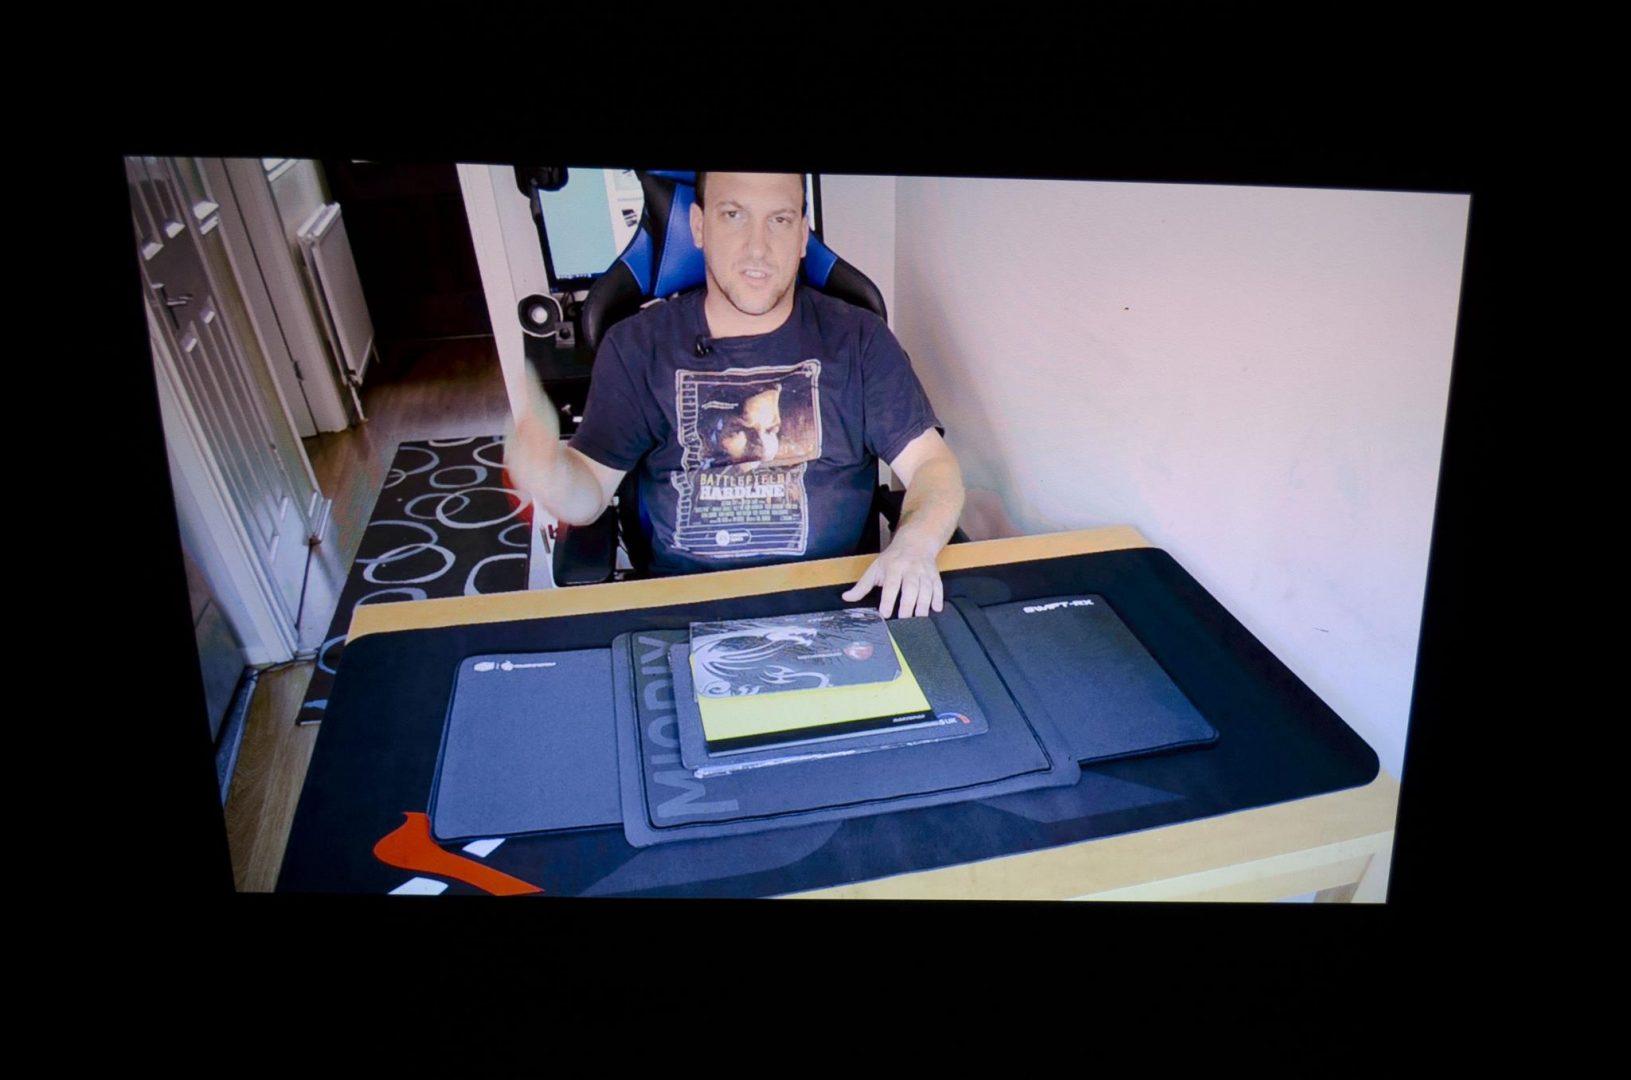 benq w1210st projector_10